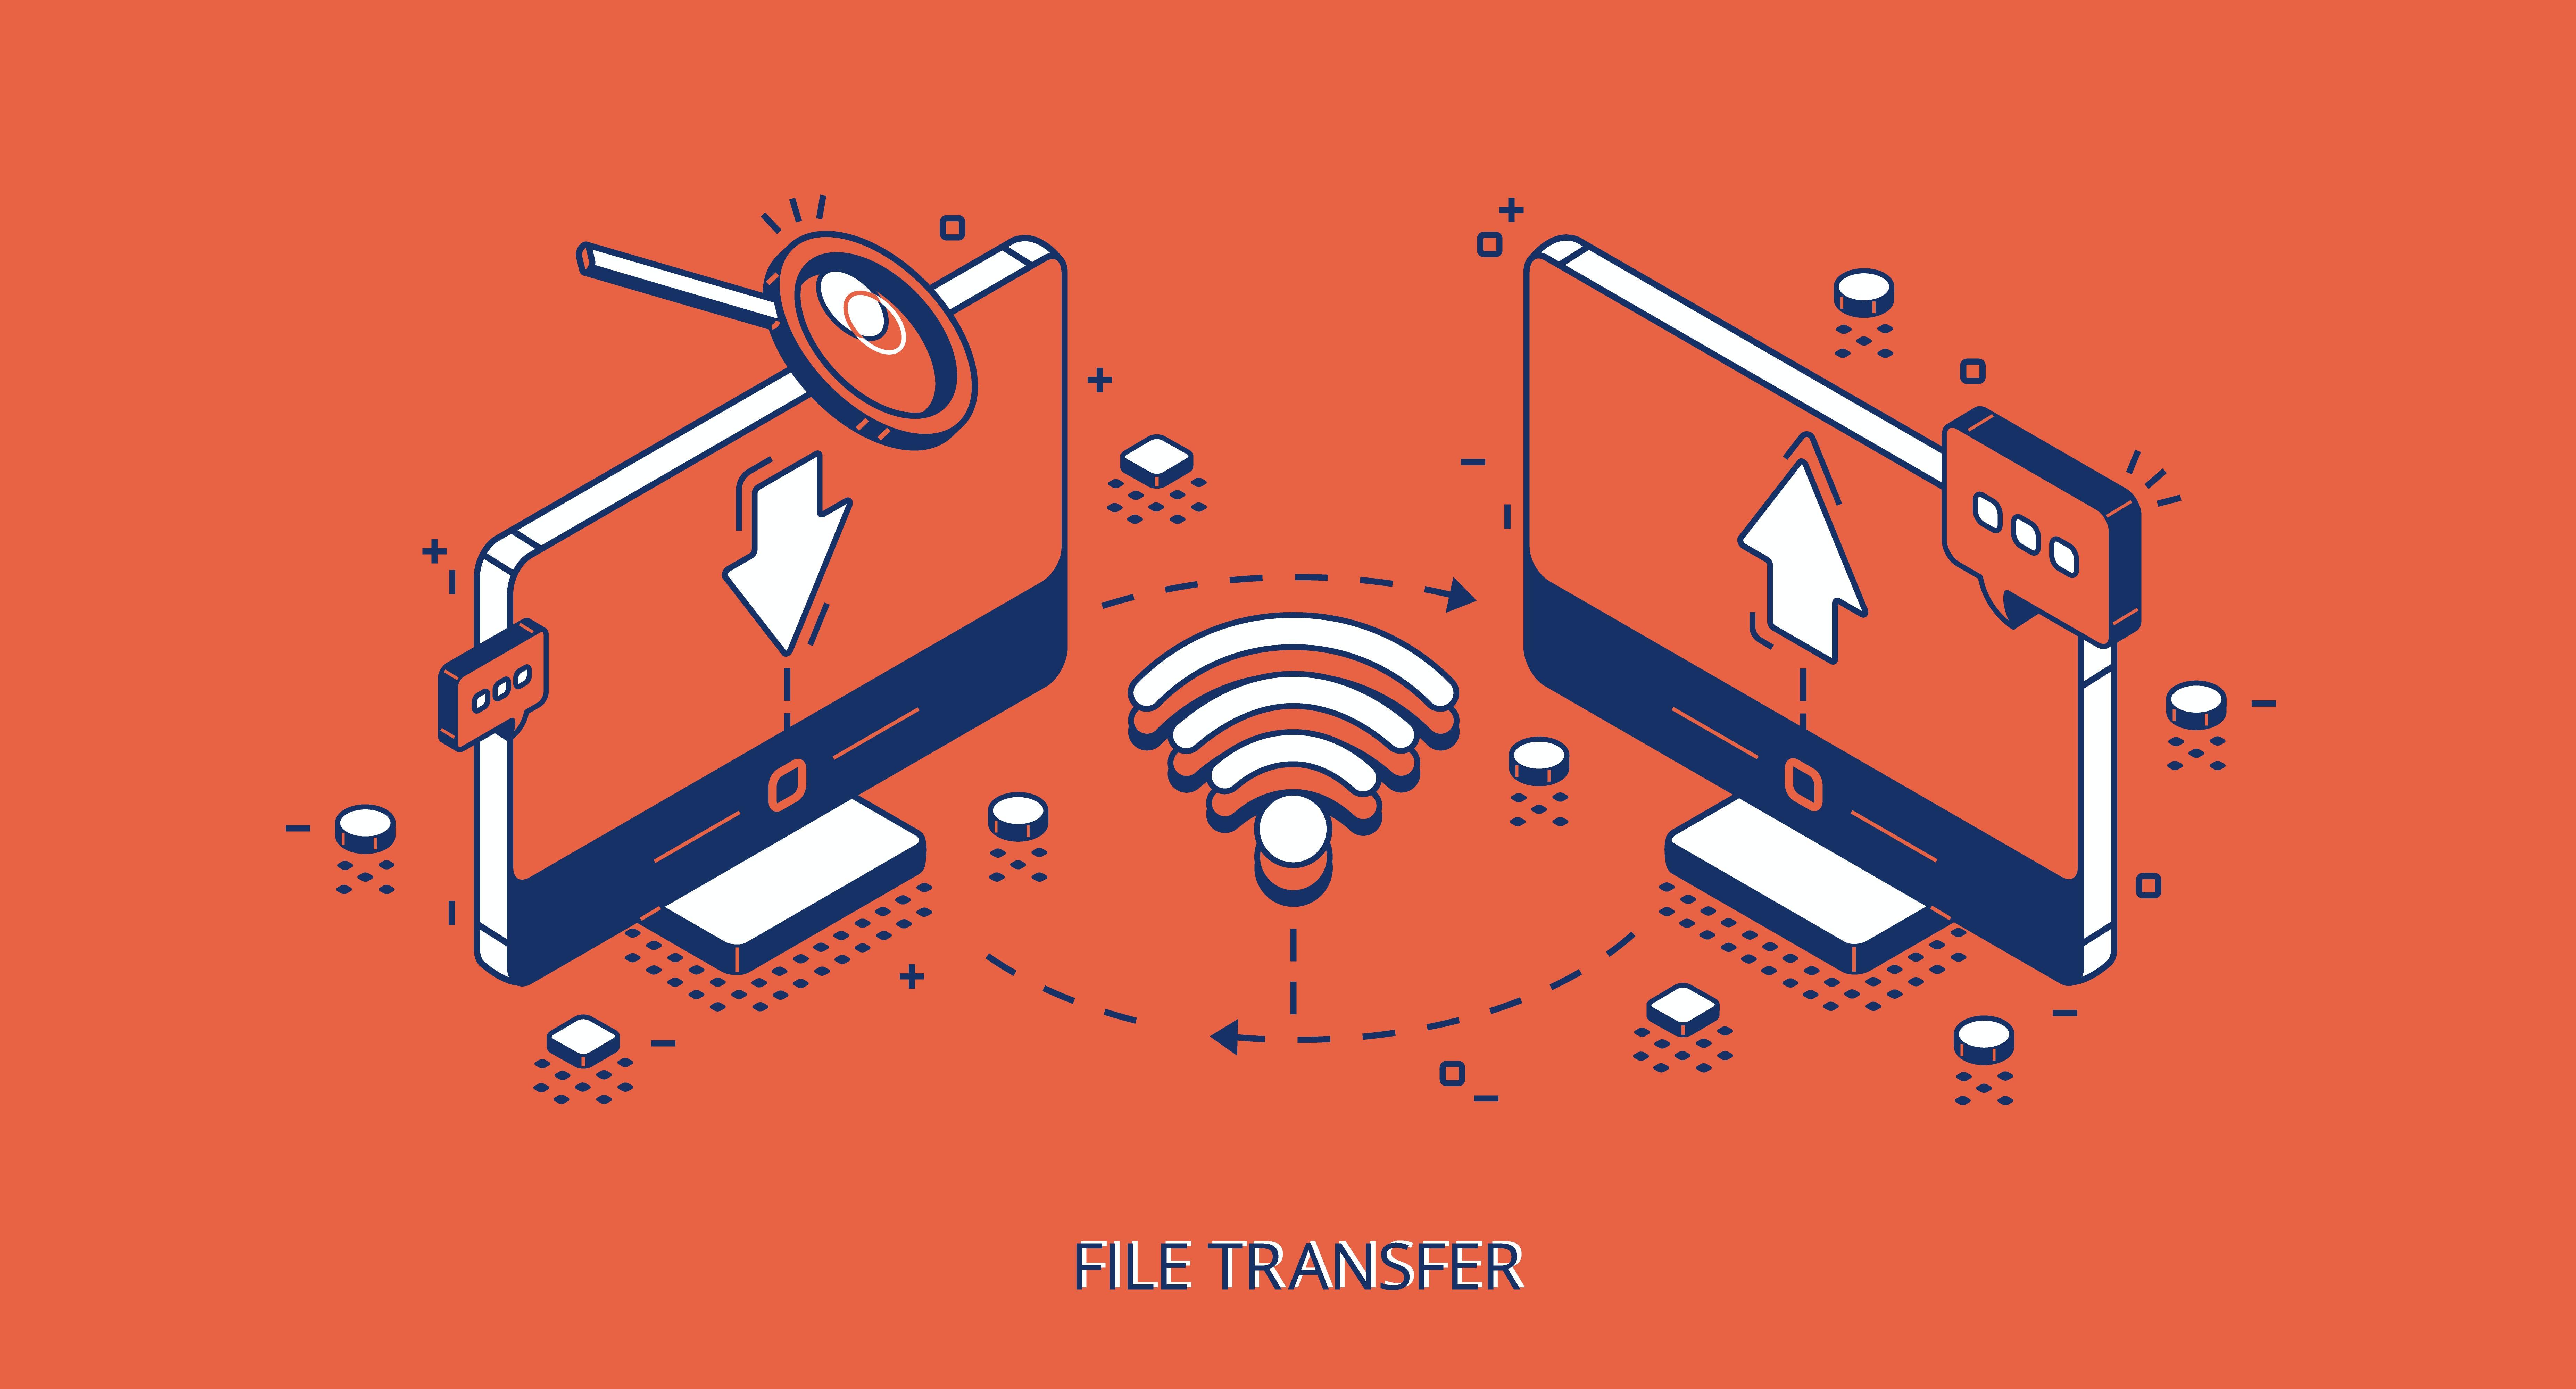 Image showing data transfer